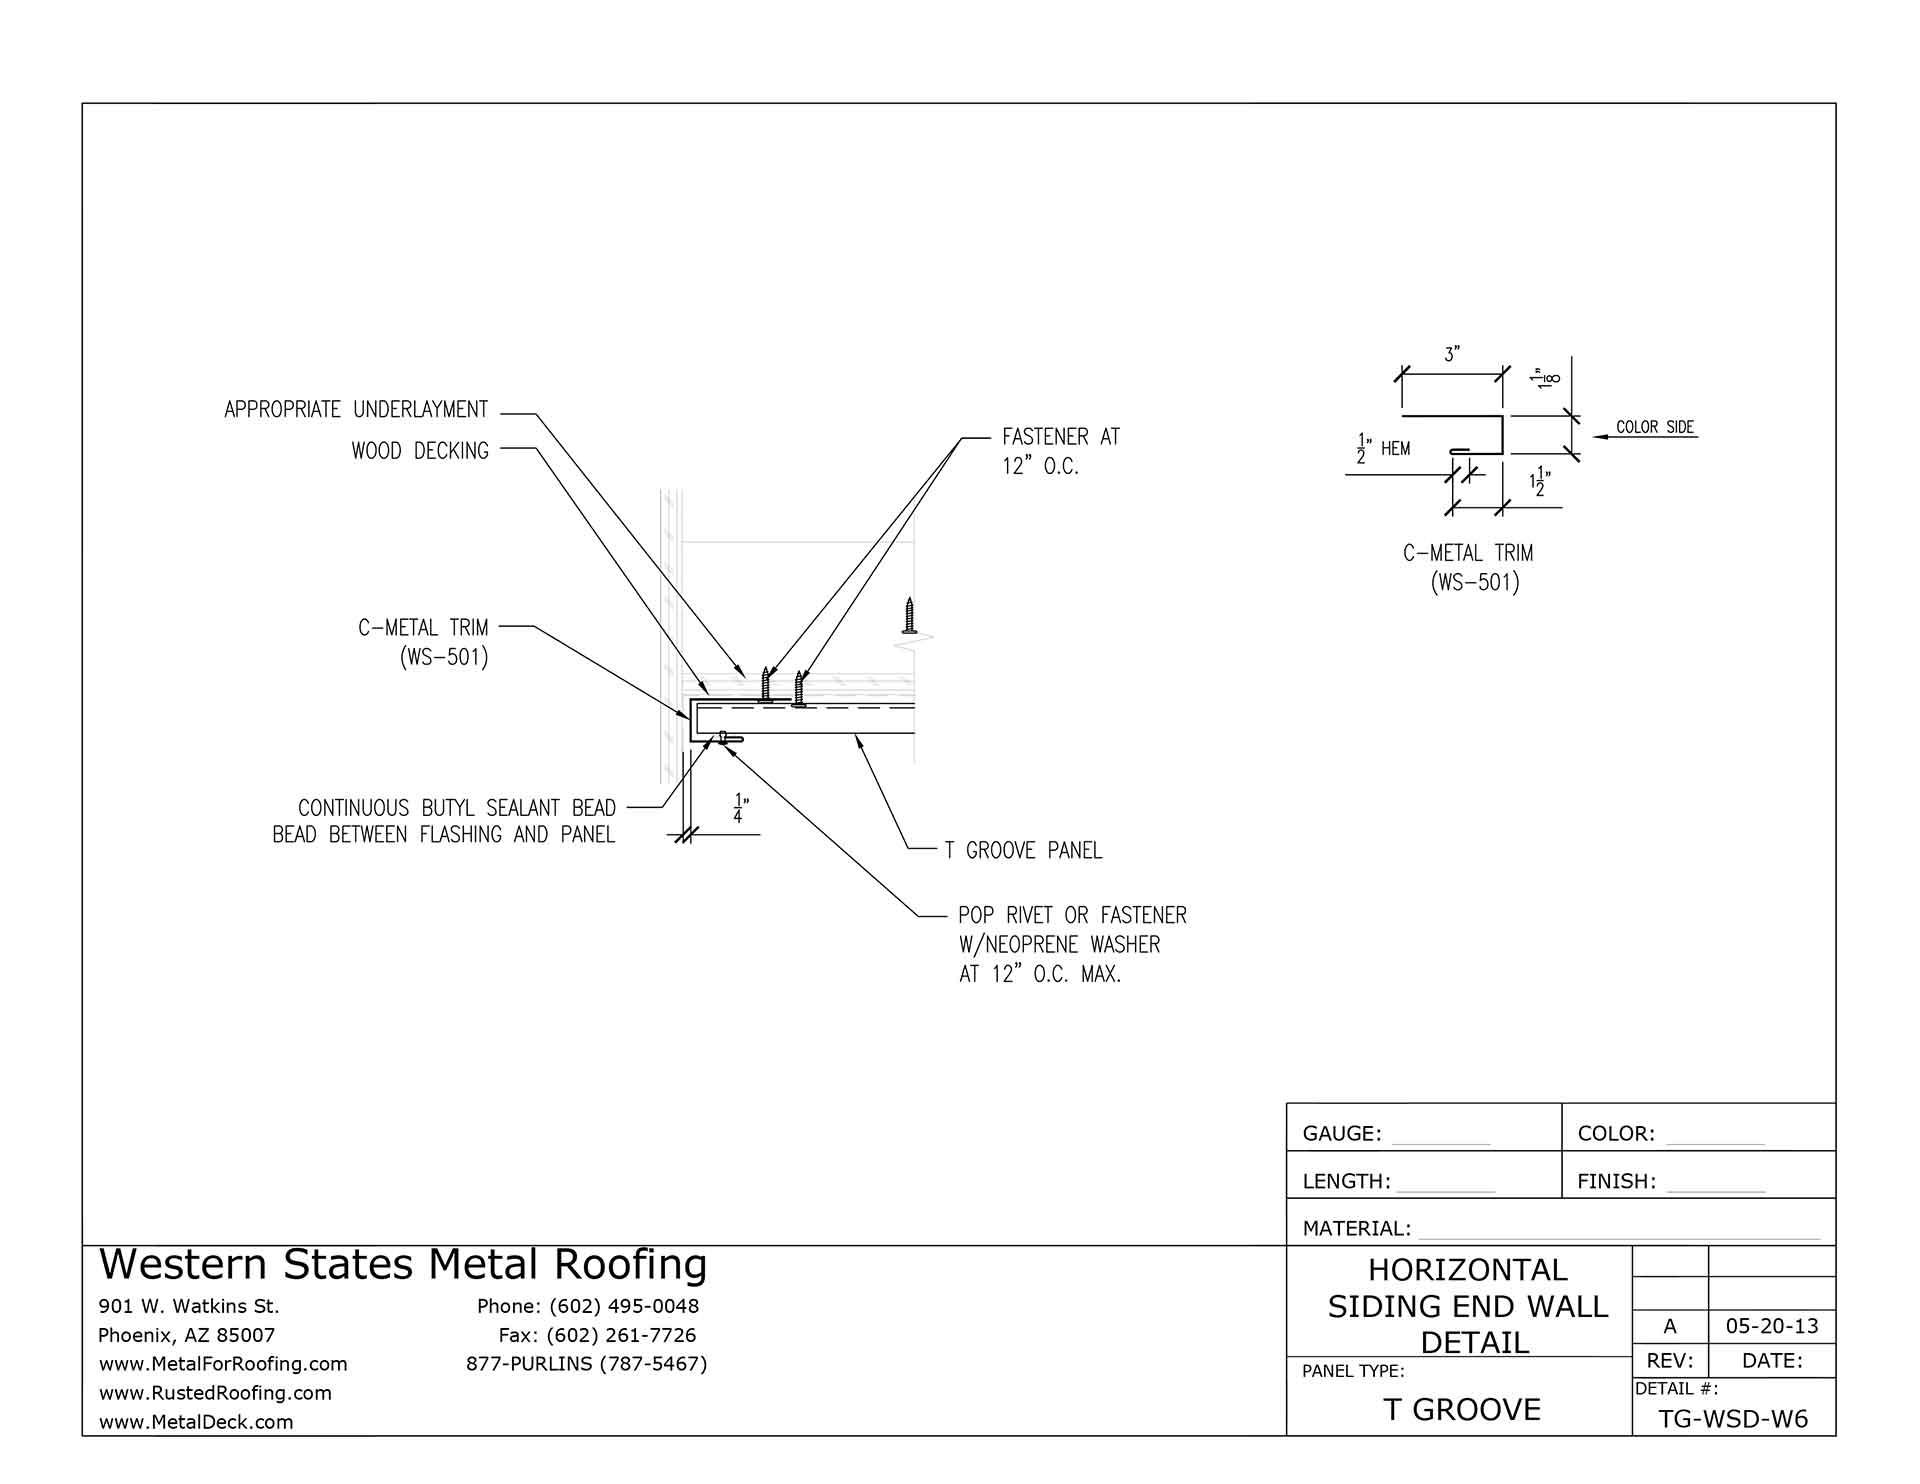 https://f.hubspotusercontent30.net/hubfs/6069238/images/trim-flashings/t-groove/tg-wsd-w6-horizontal-siding-end-wall-detail.jpg